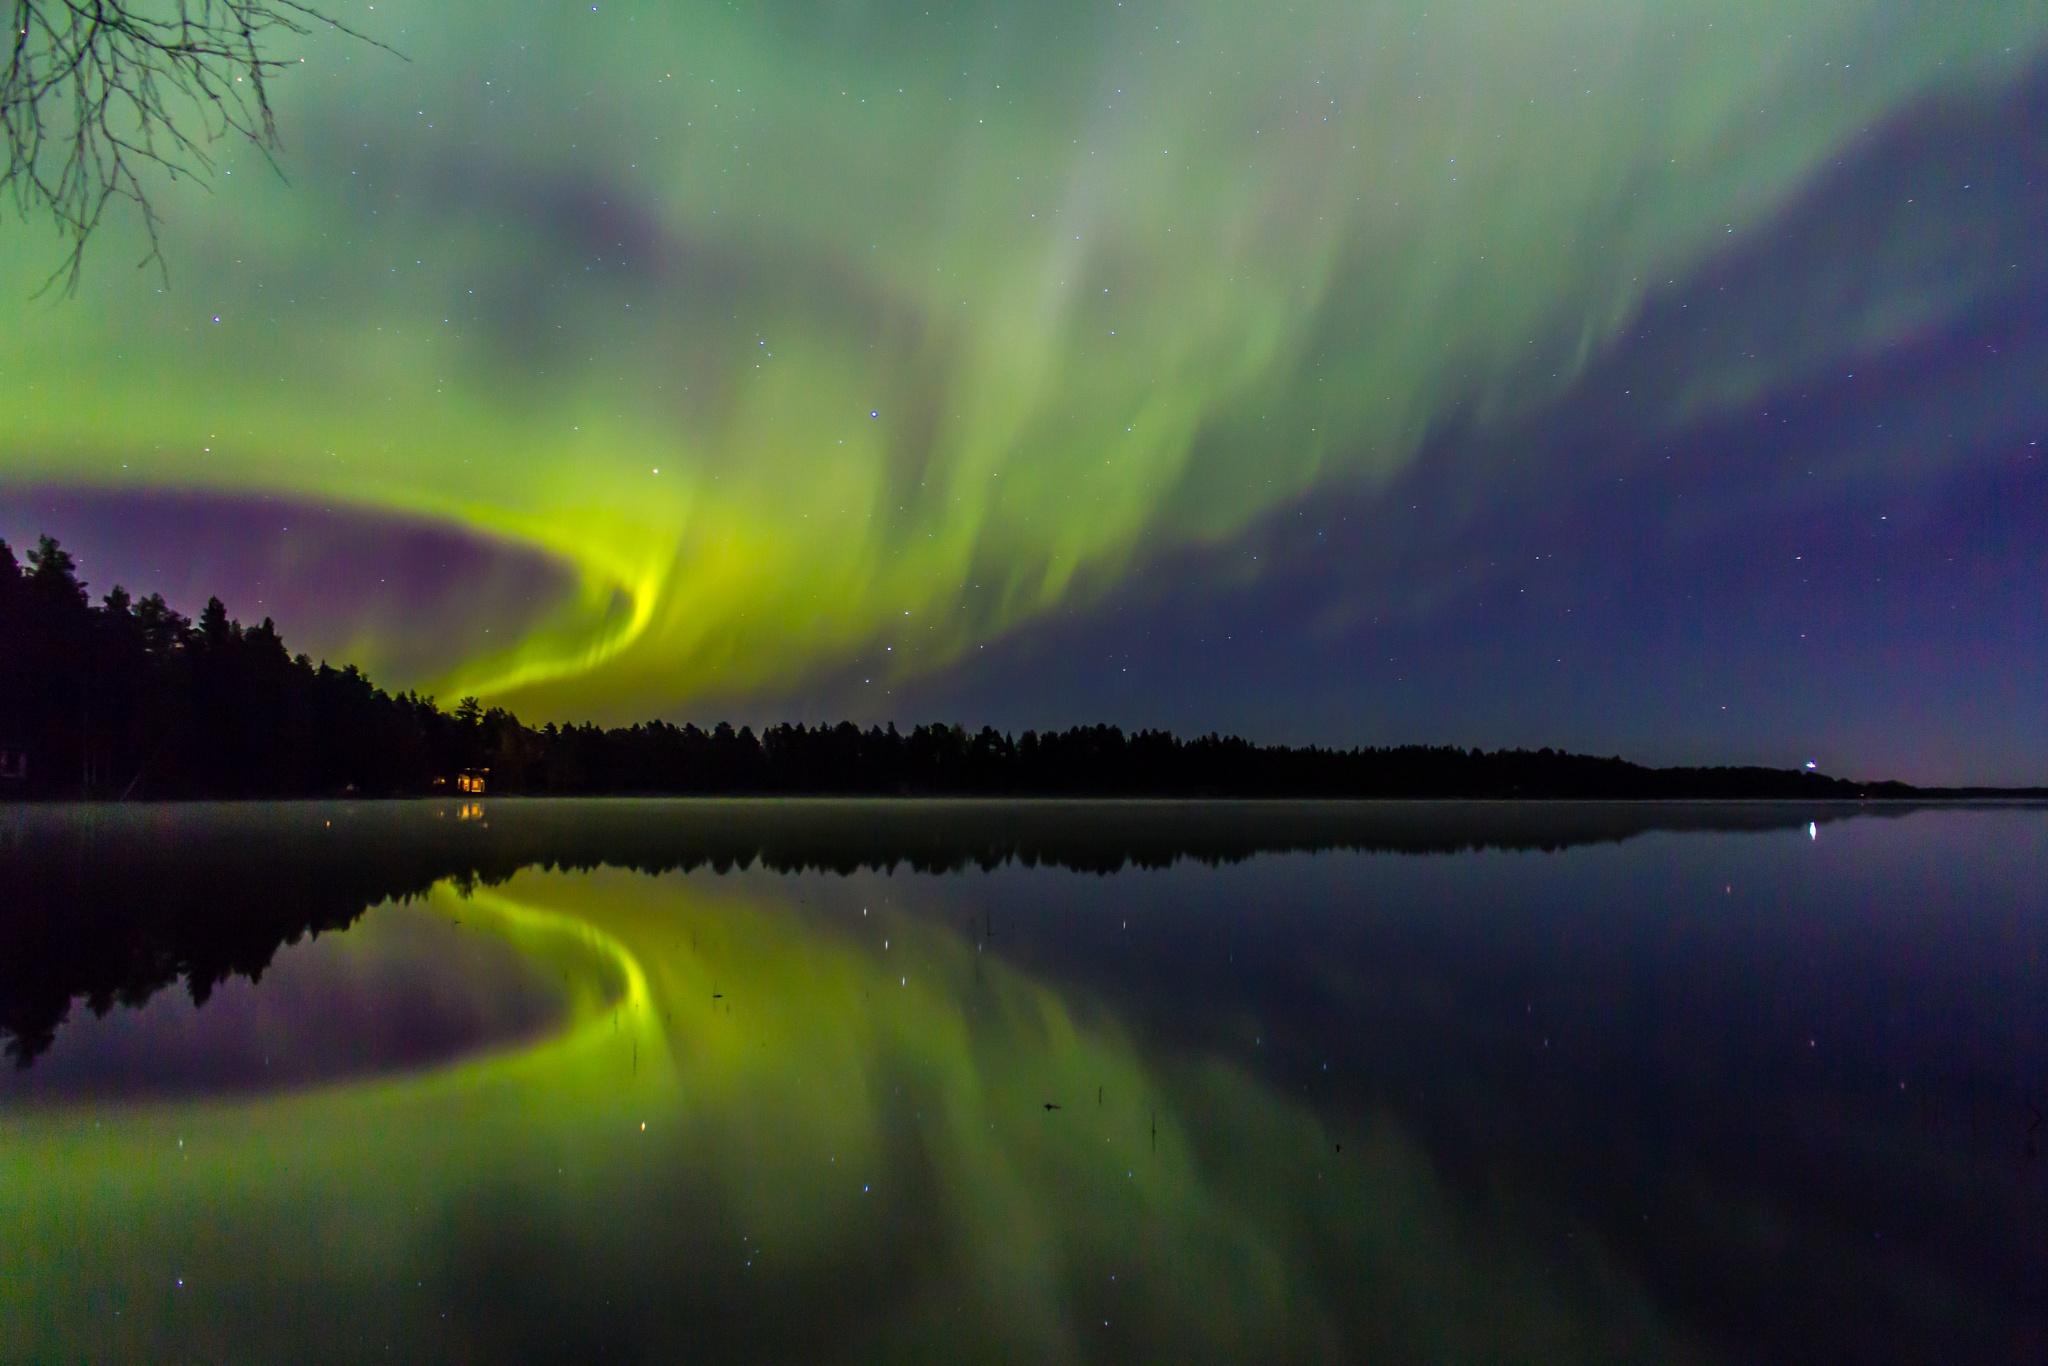 Auroras by Sami Tiainen